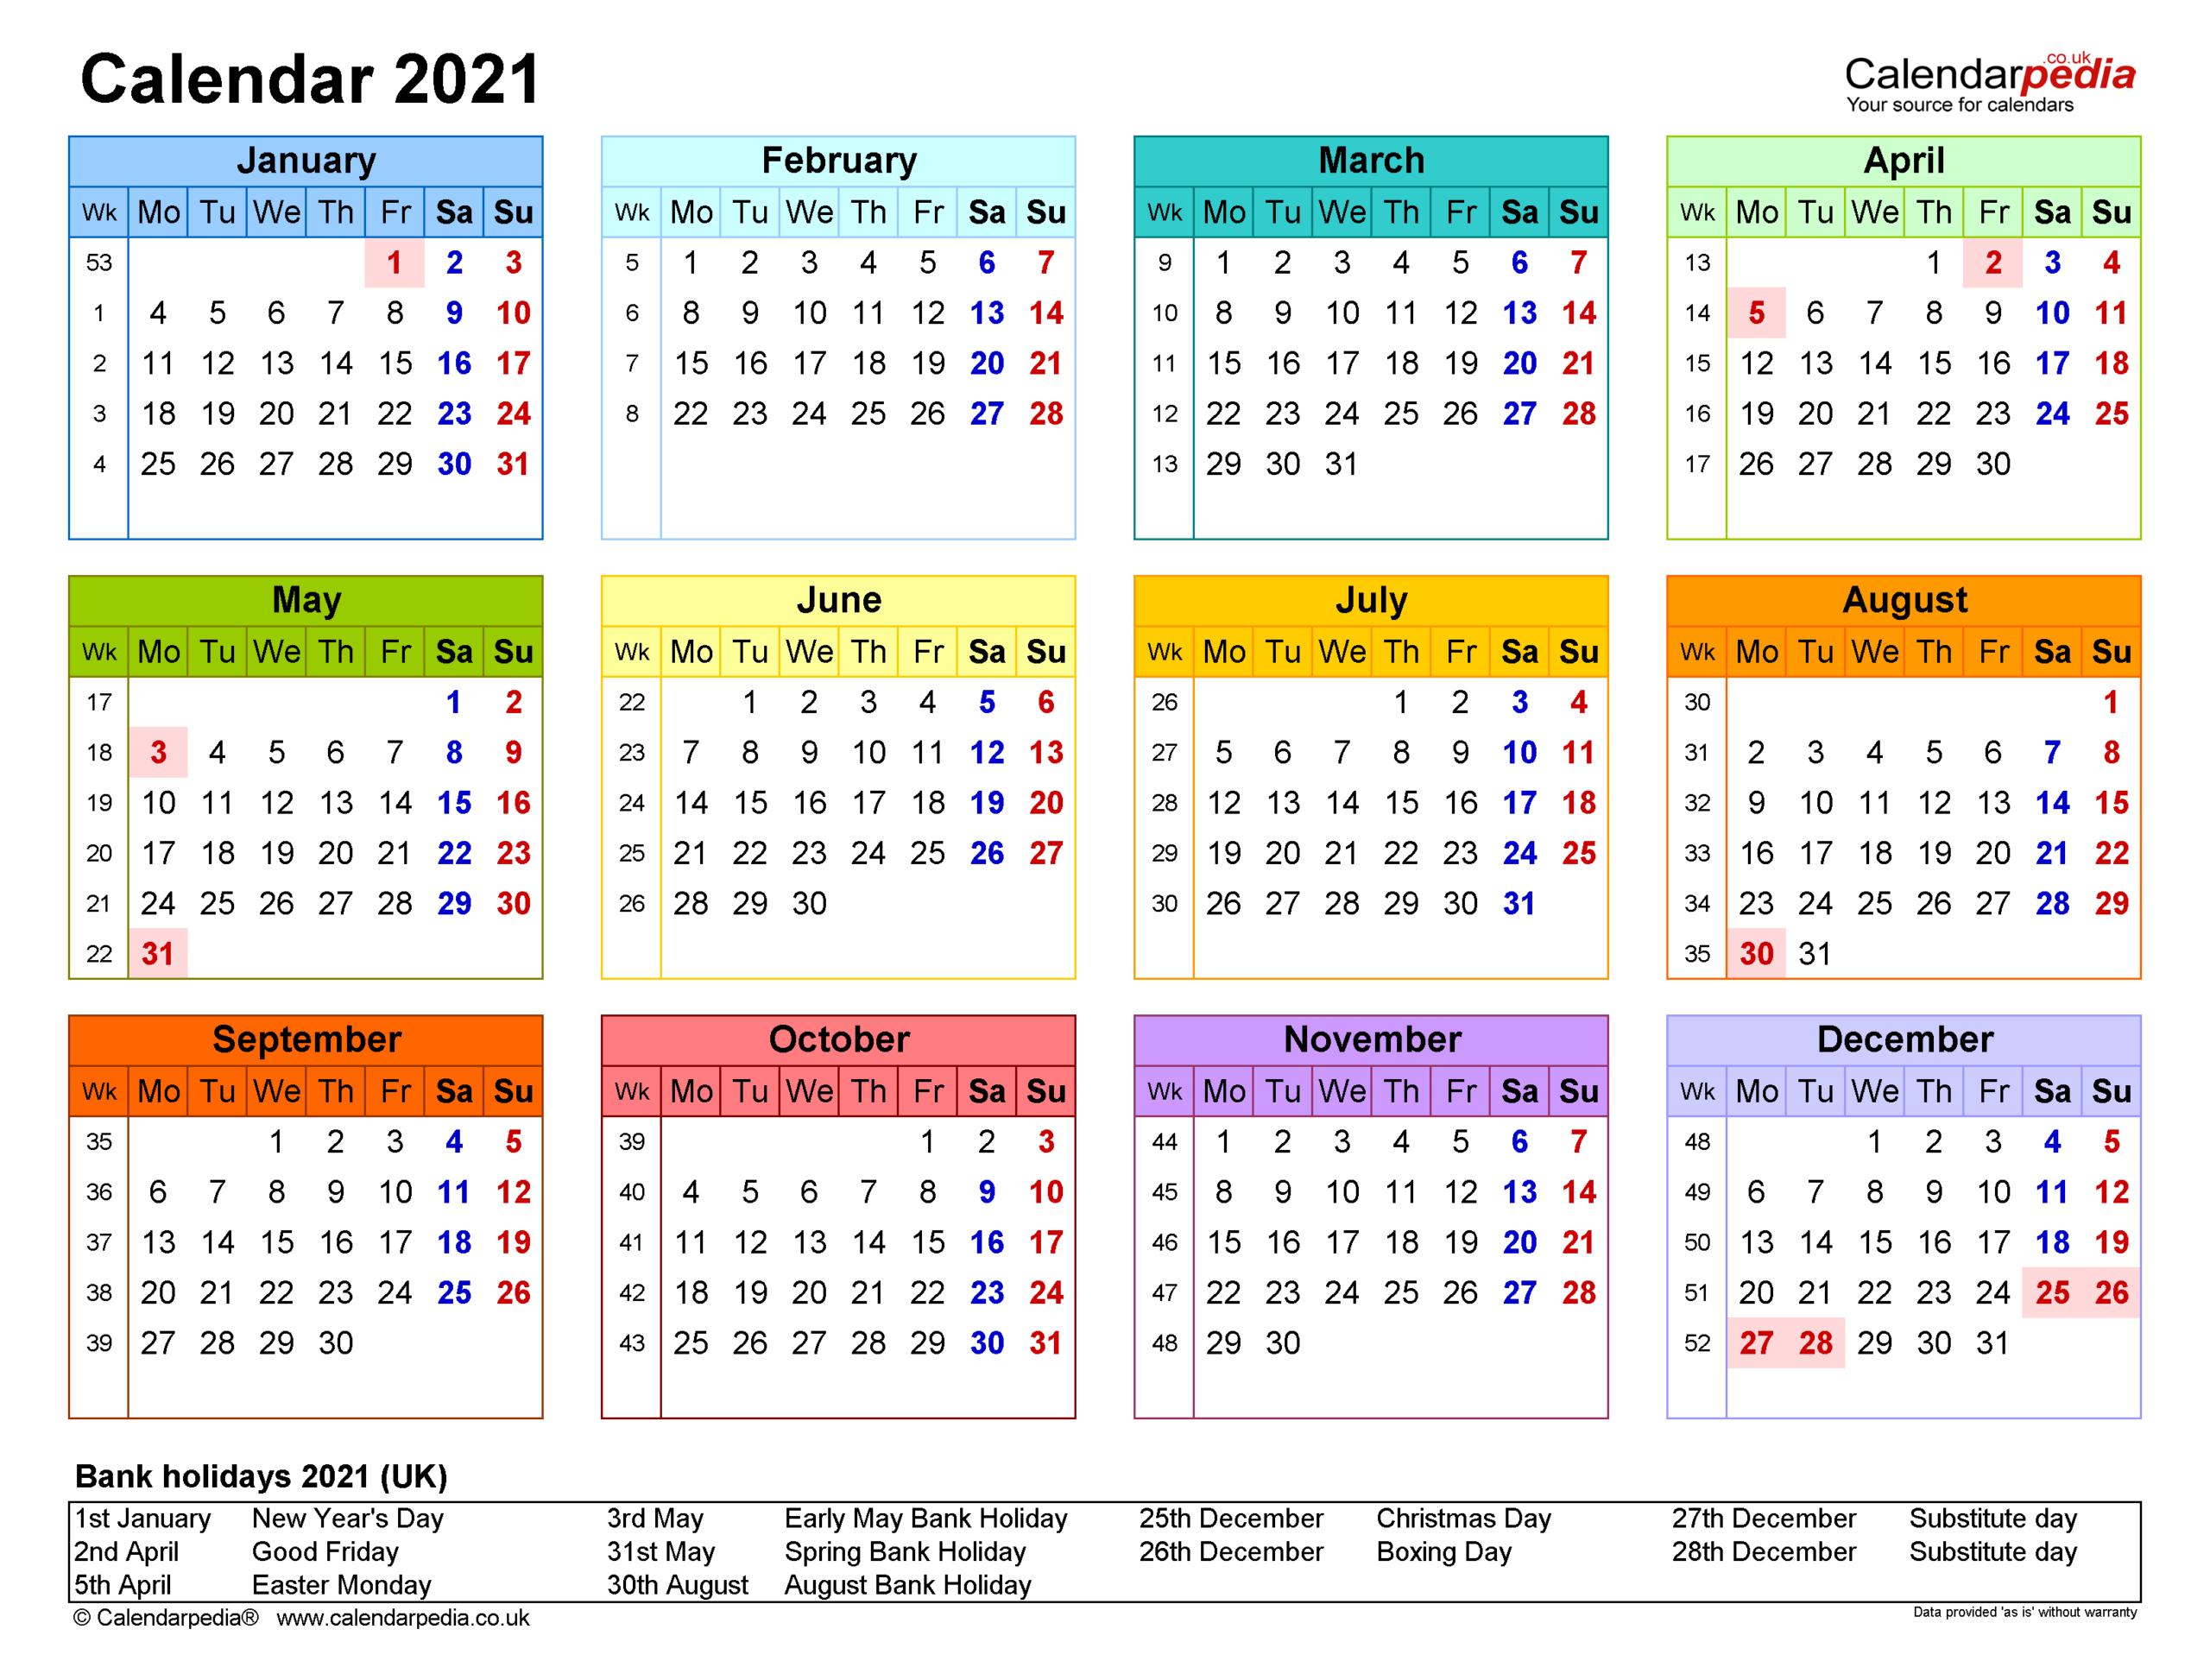 Kalender 2021 A3 Format